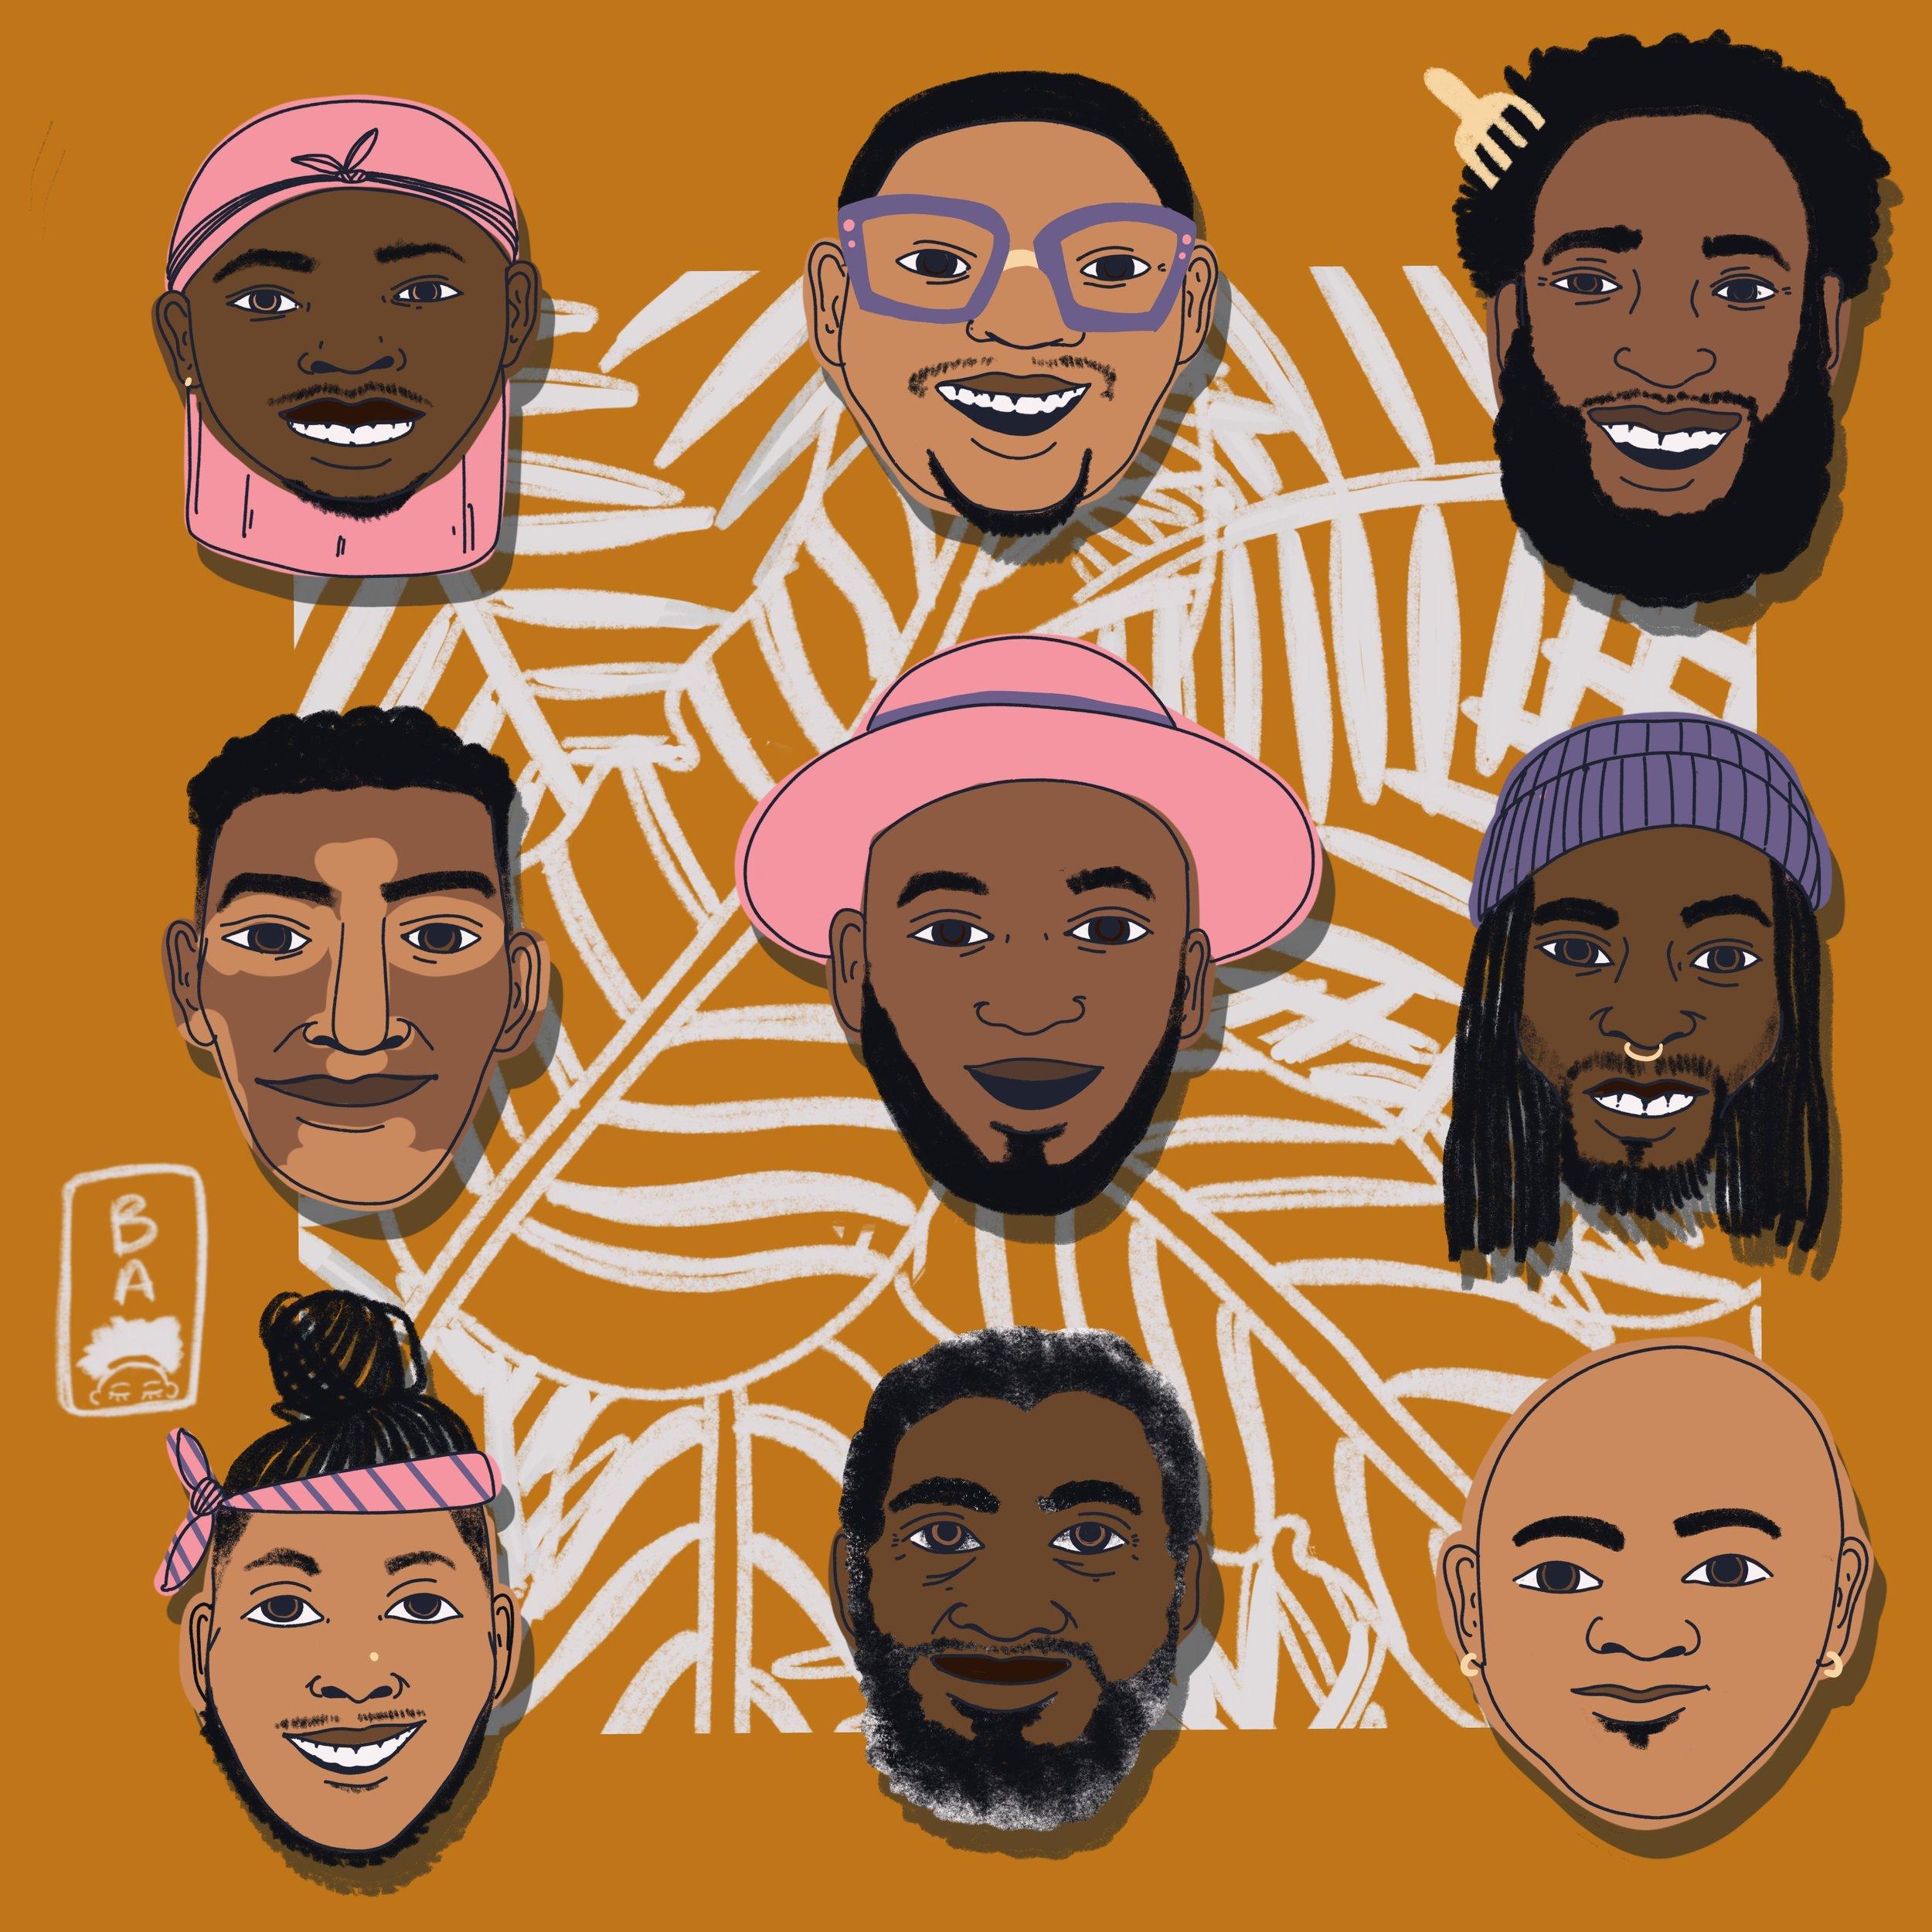 Black Men Smile (2018)